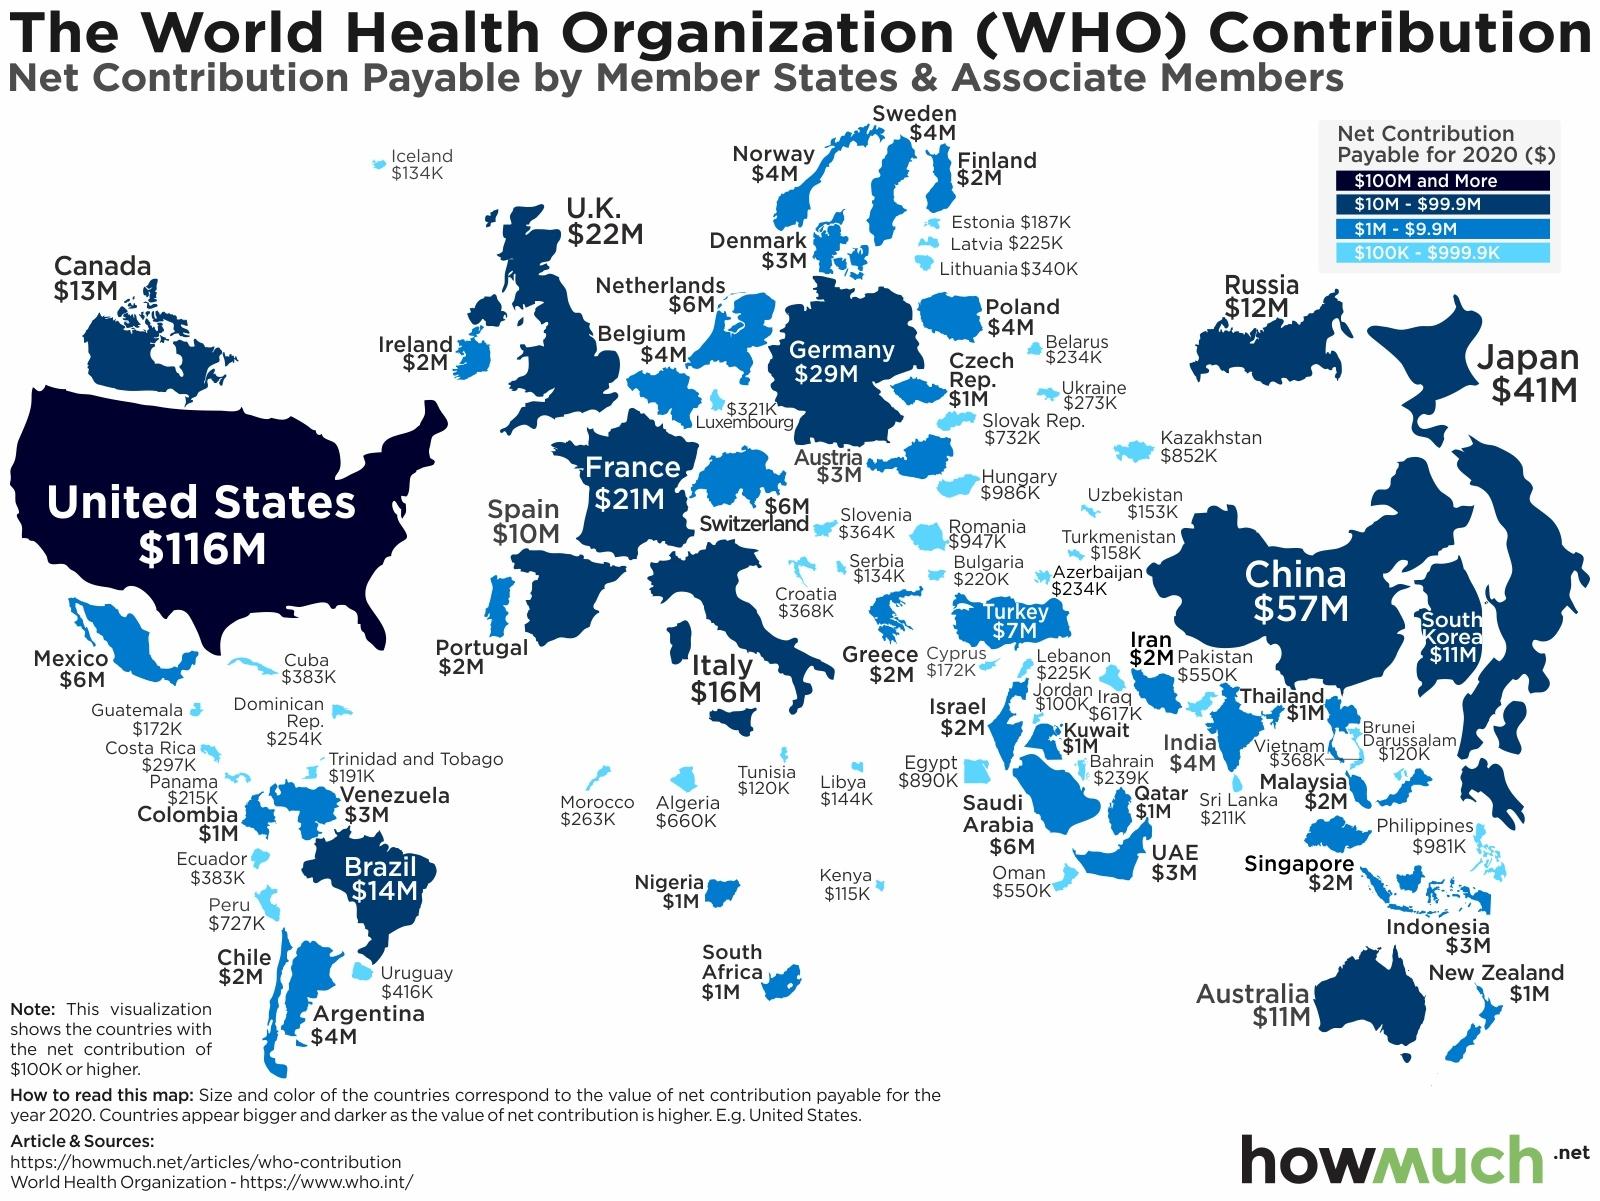 the world health organization contribution